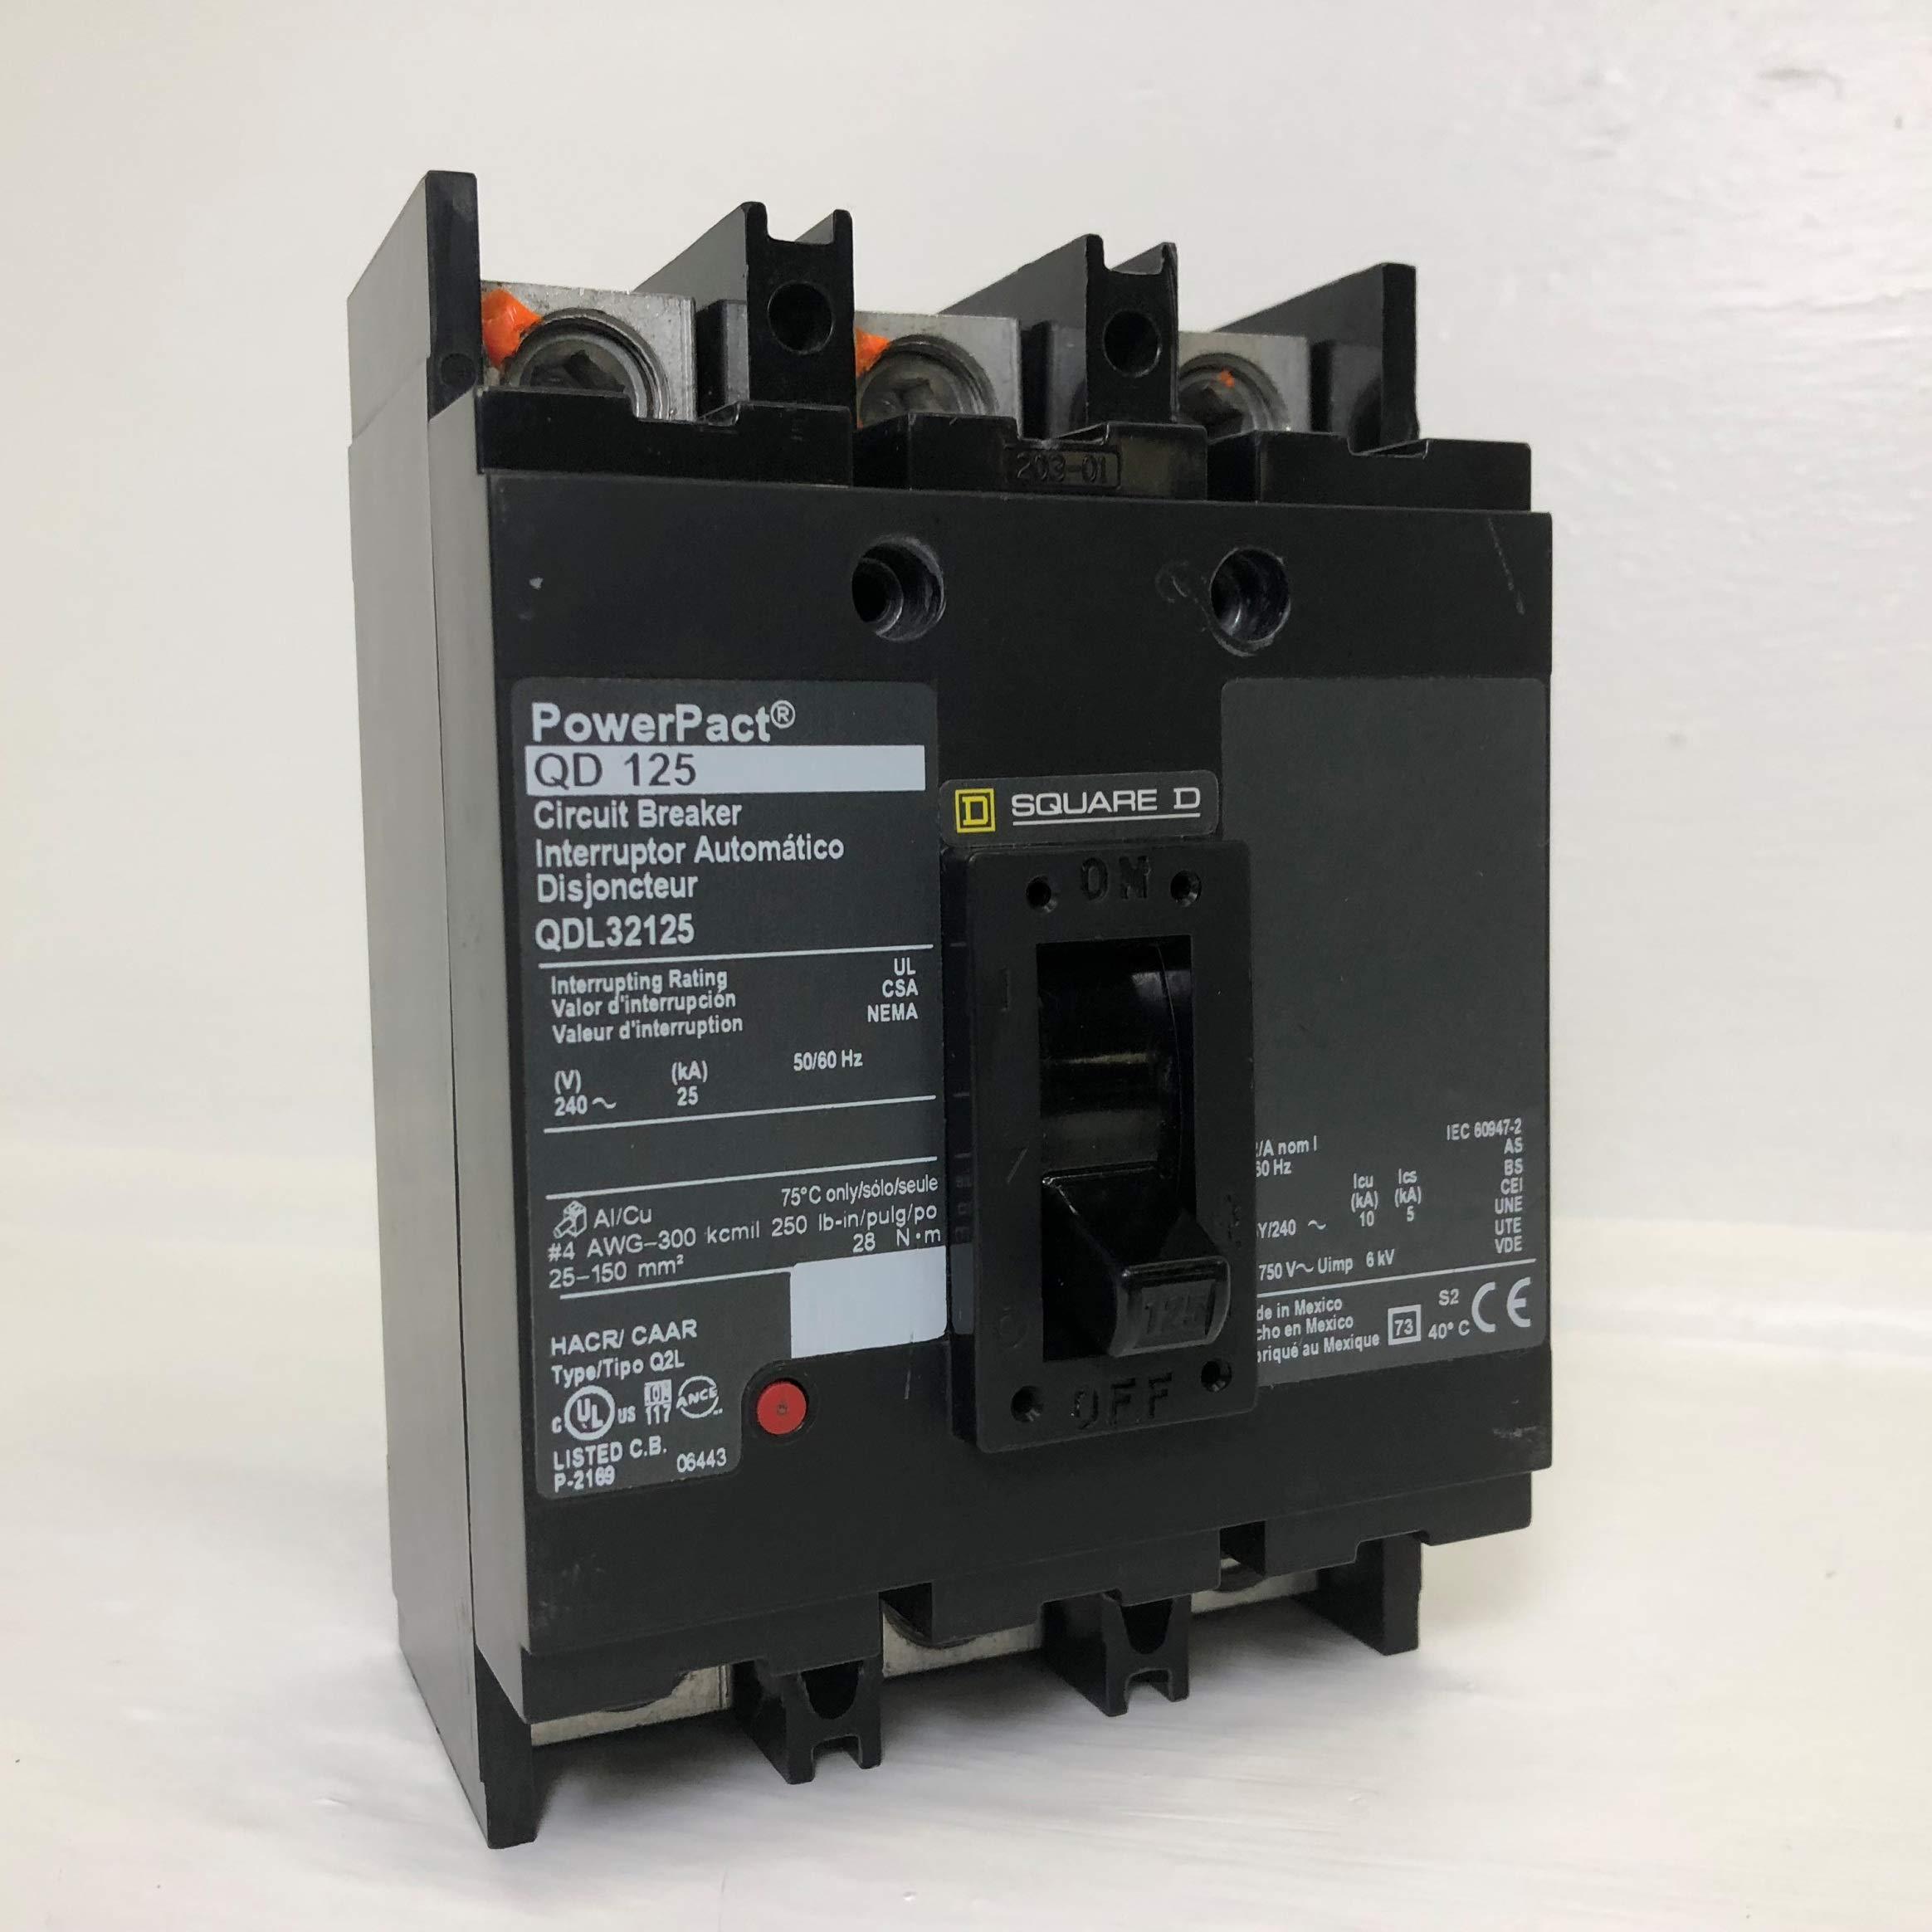 Square D - QDL32125 - Circuit Breaker, 125 Amps, Number of Poles: 3, 240VAC AC Voltage Rating